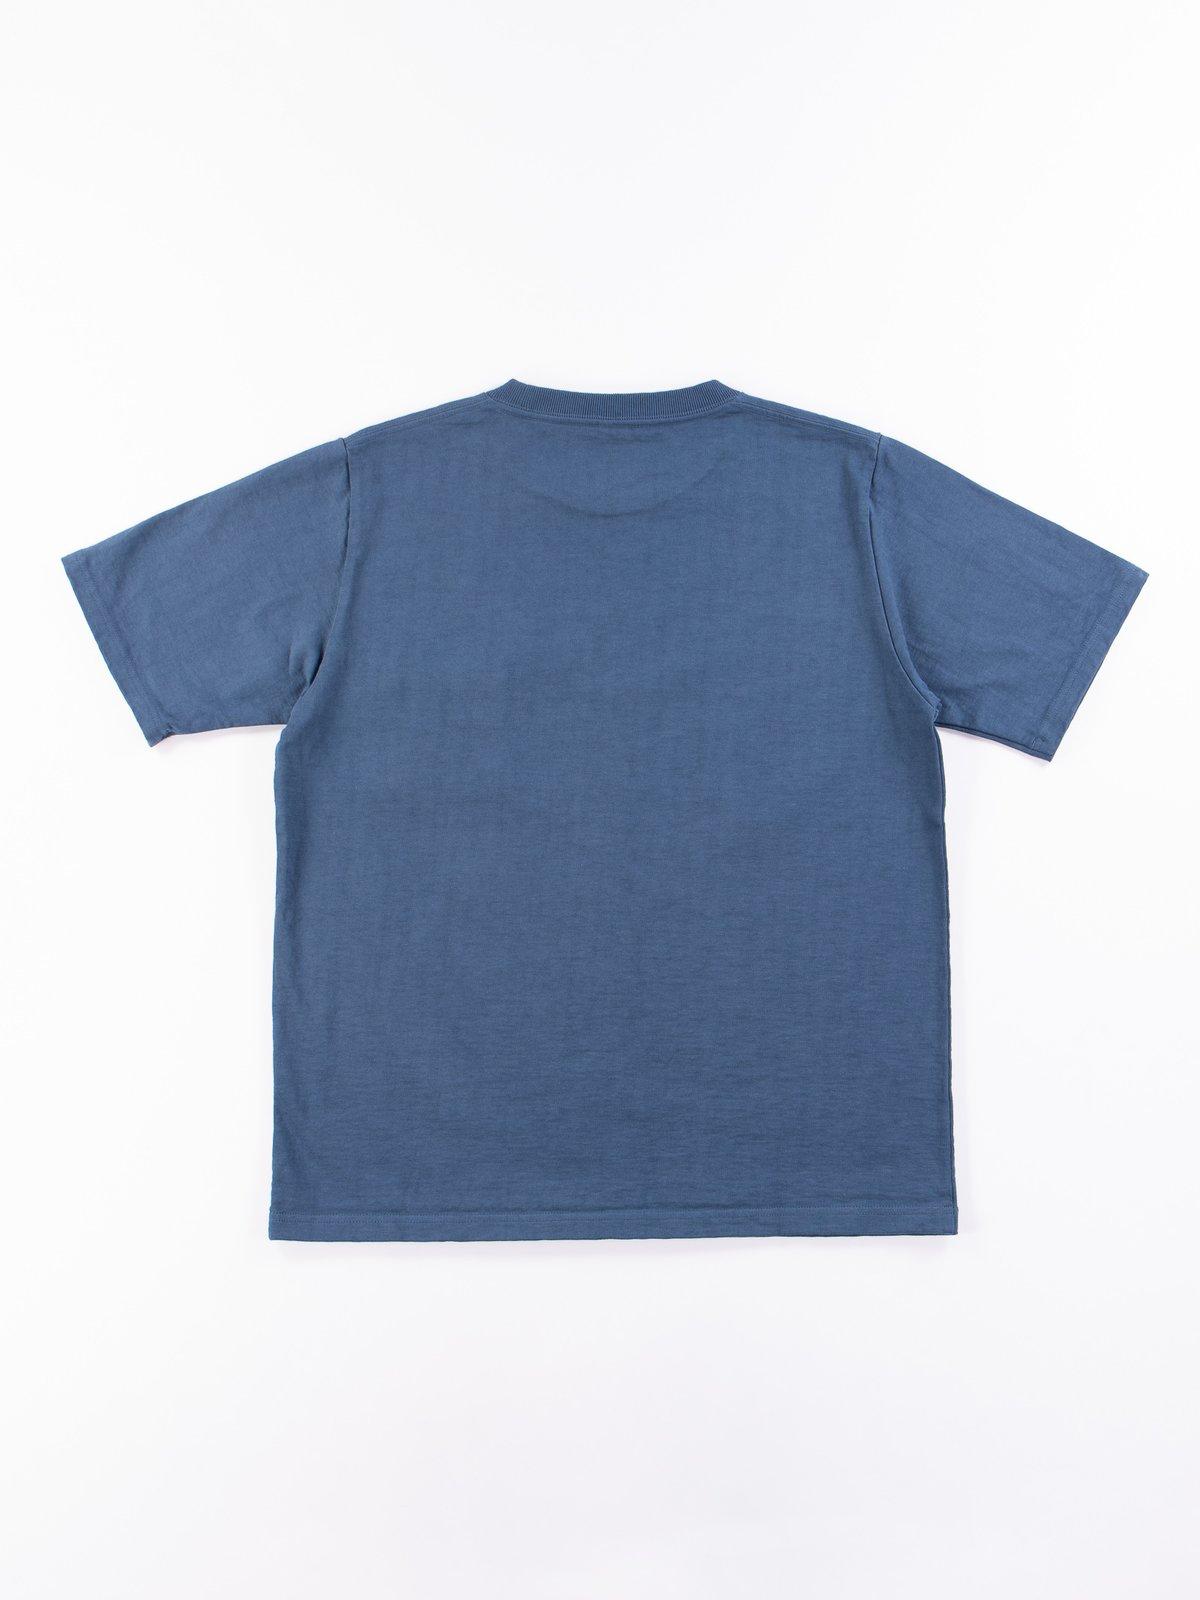 Ash Blue Dotsume Pocket T–Shirt - Image 6